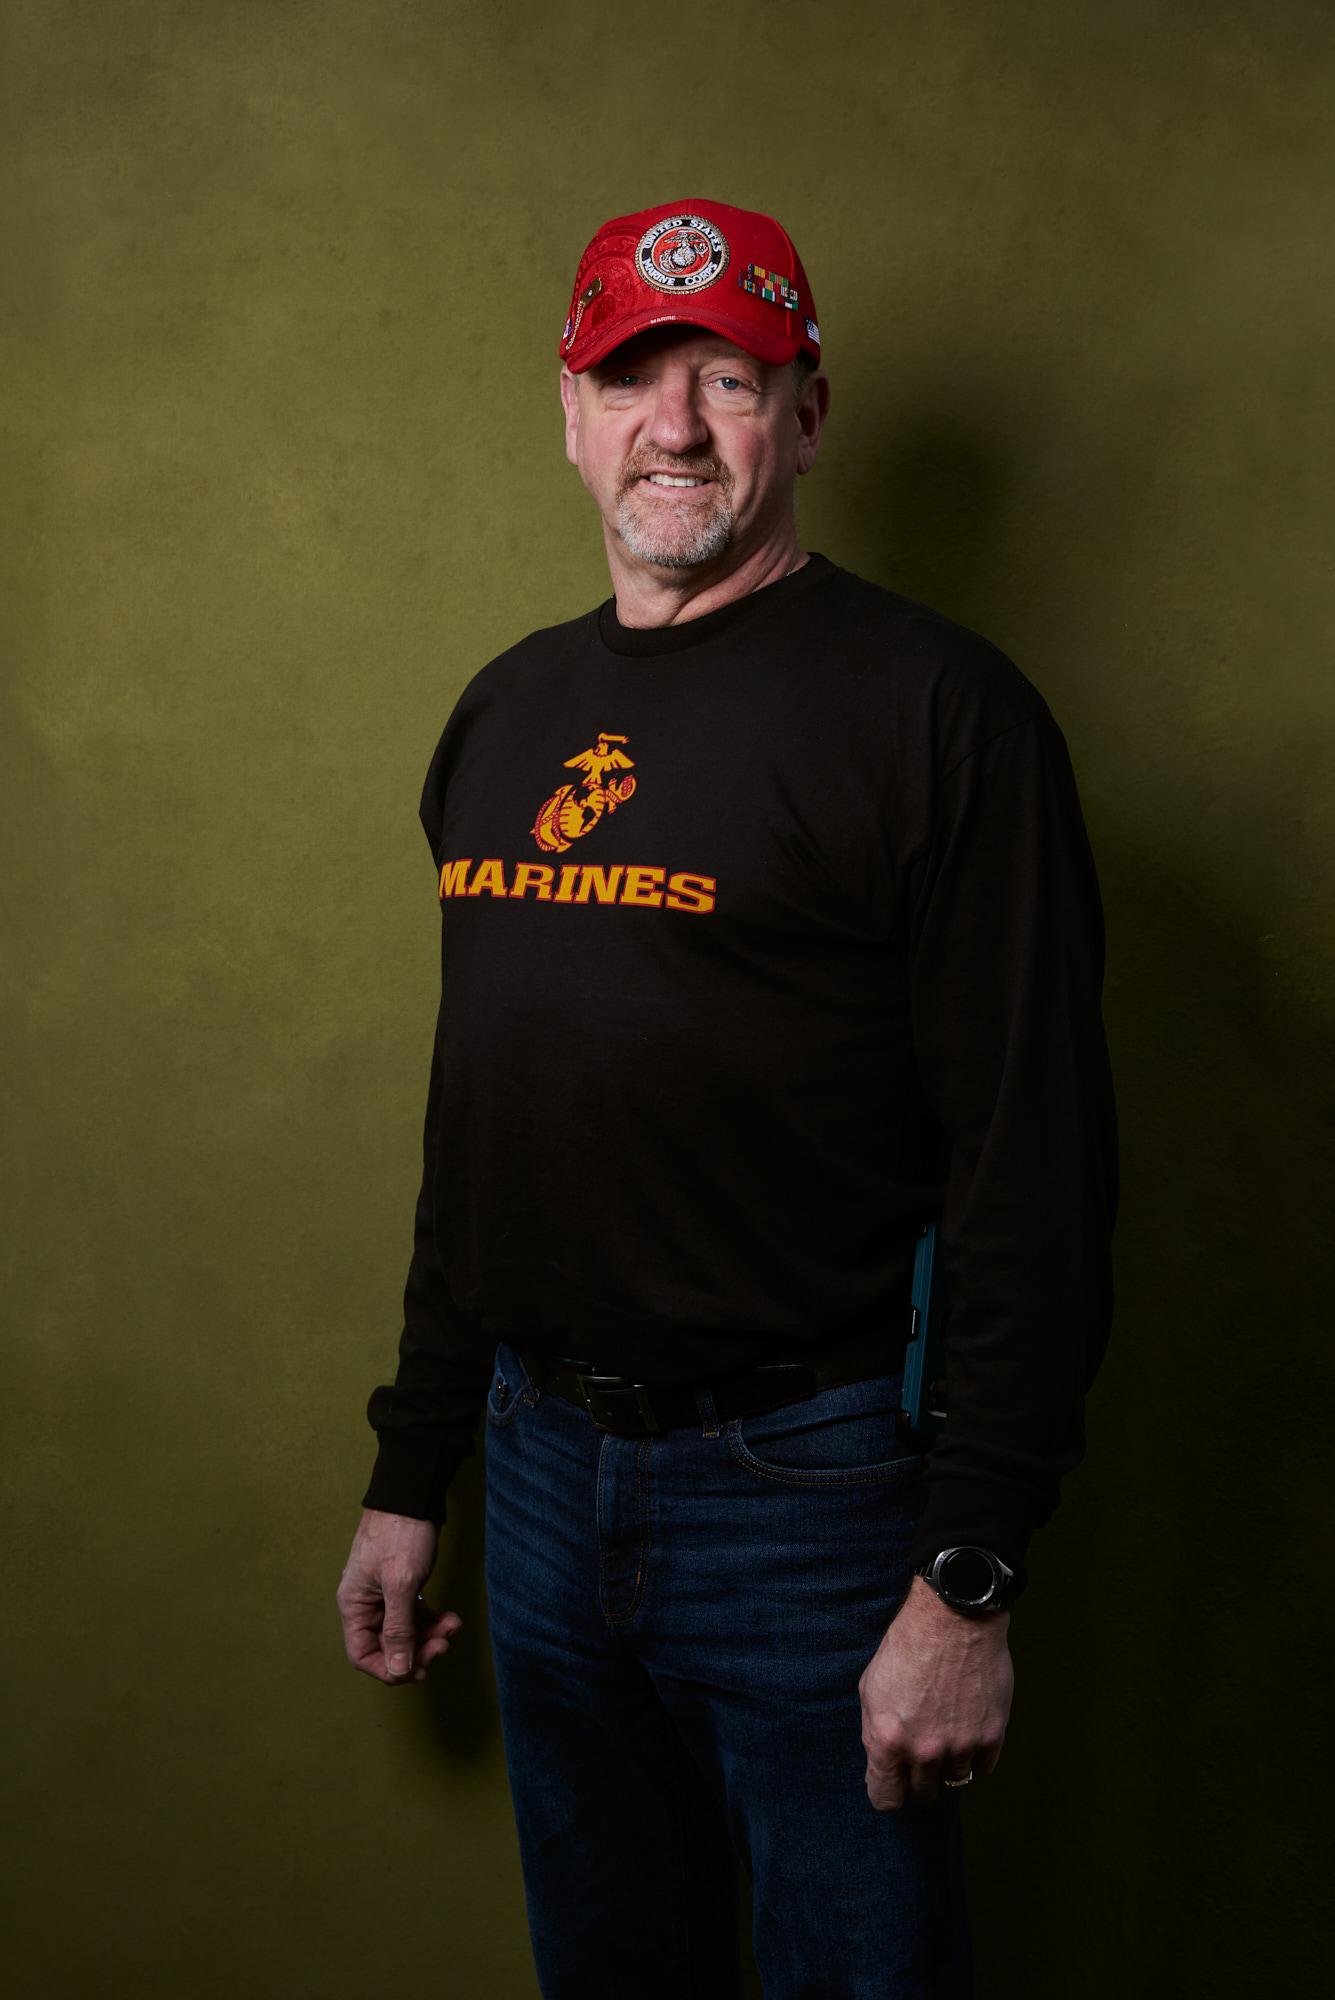 Sergeant Jim Ohlstrom